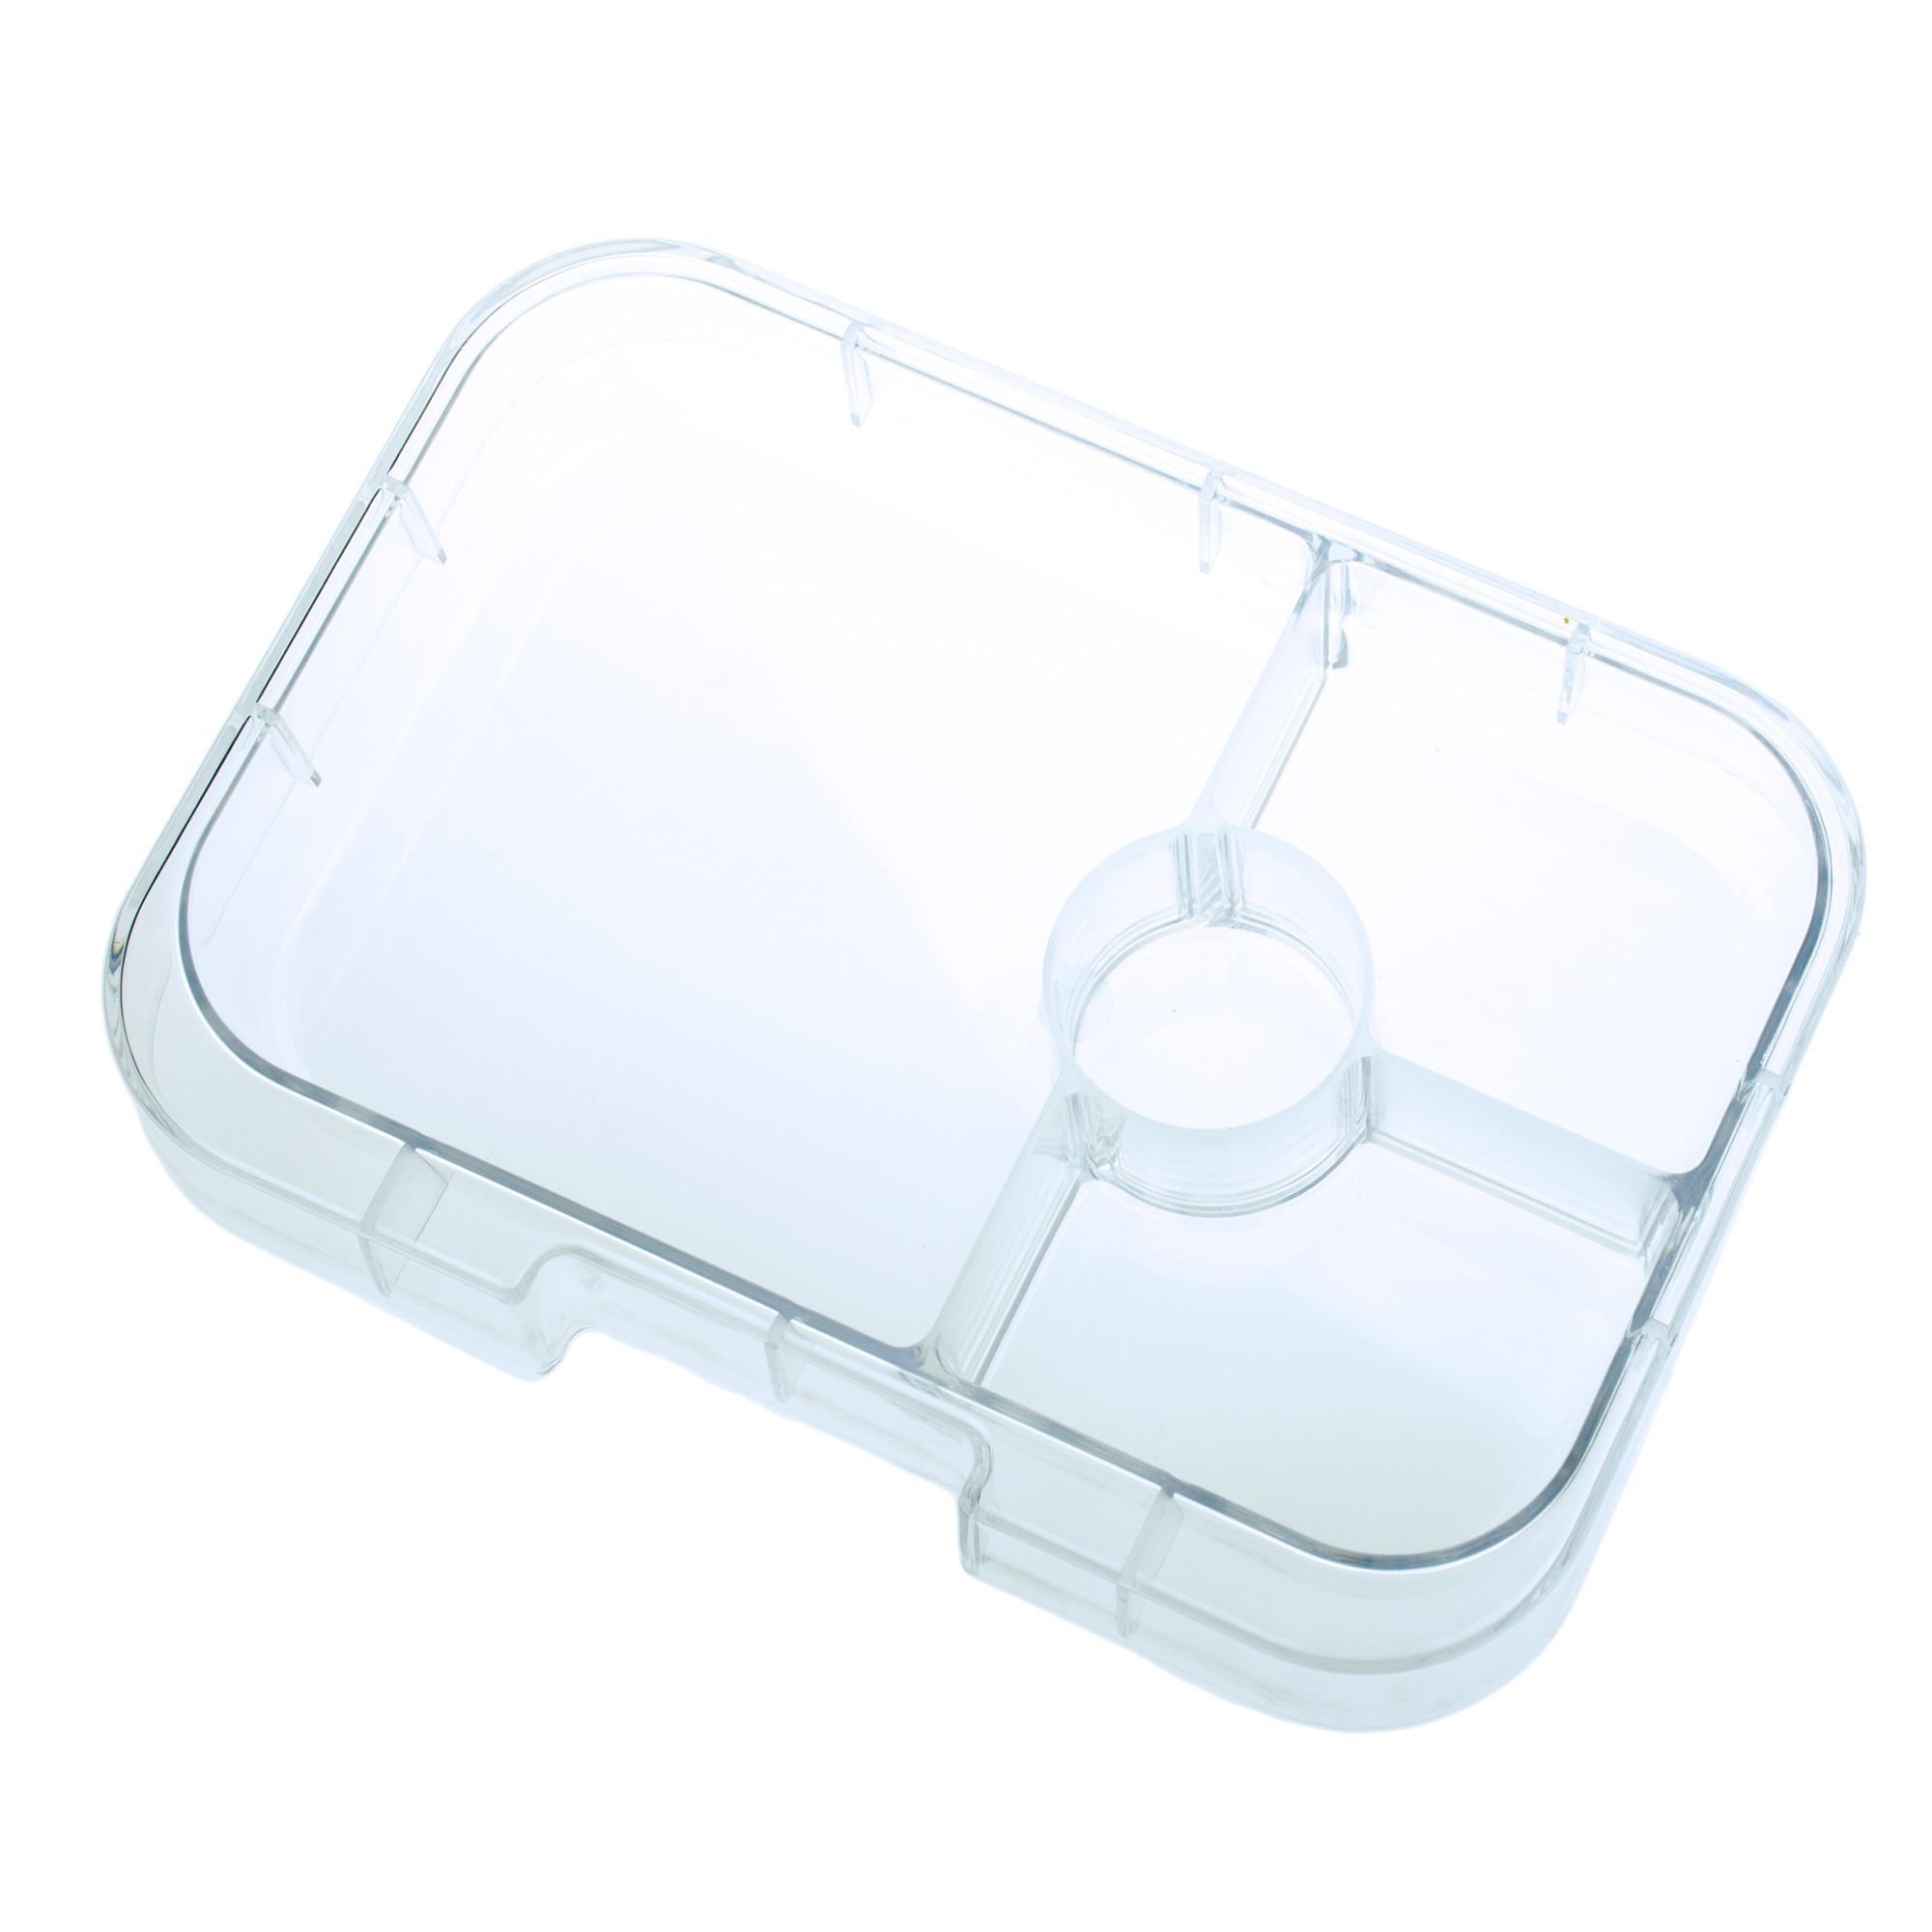 Yumbox Panino tray 4-sections Transparant-1